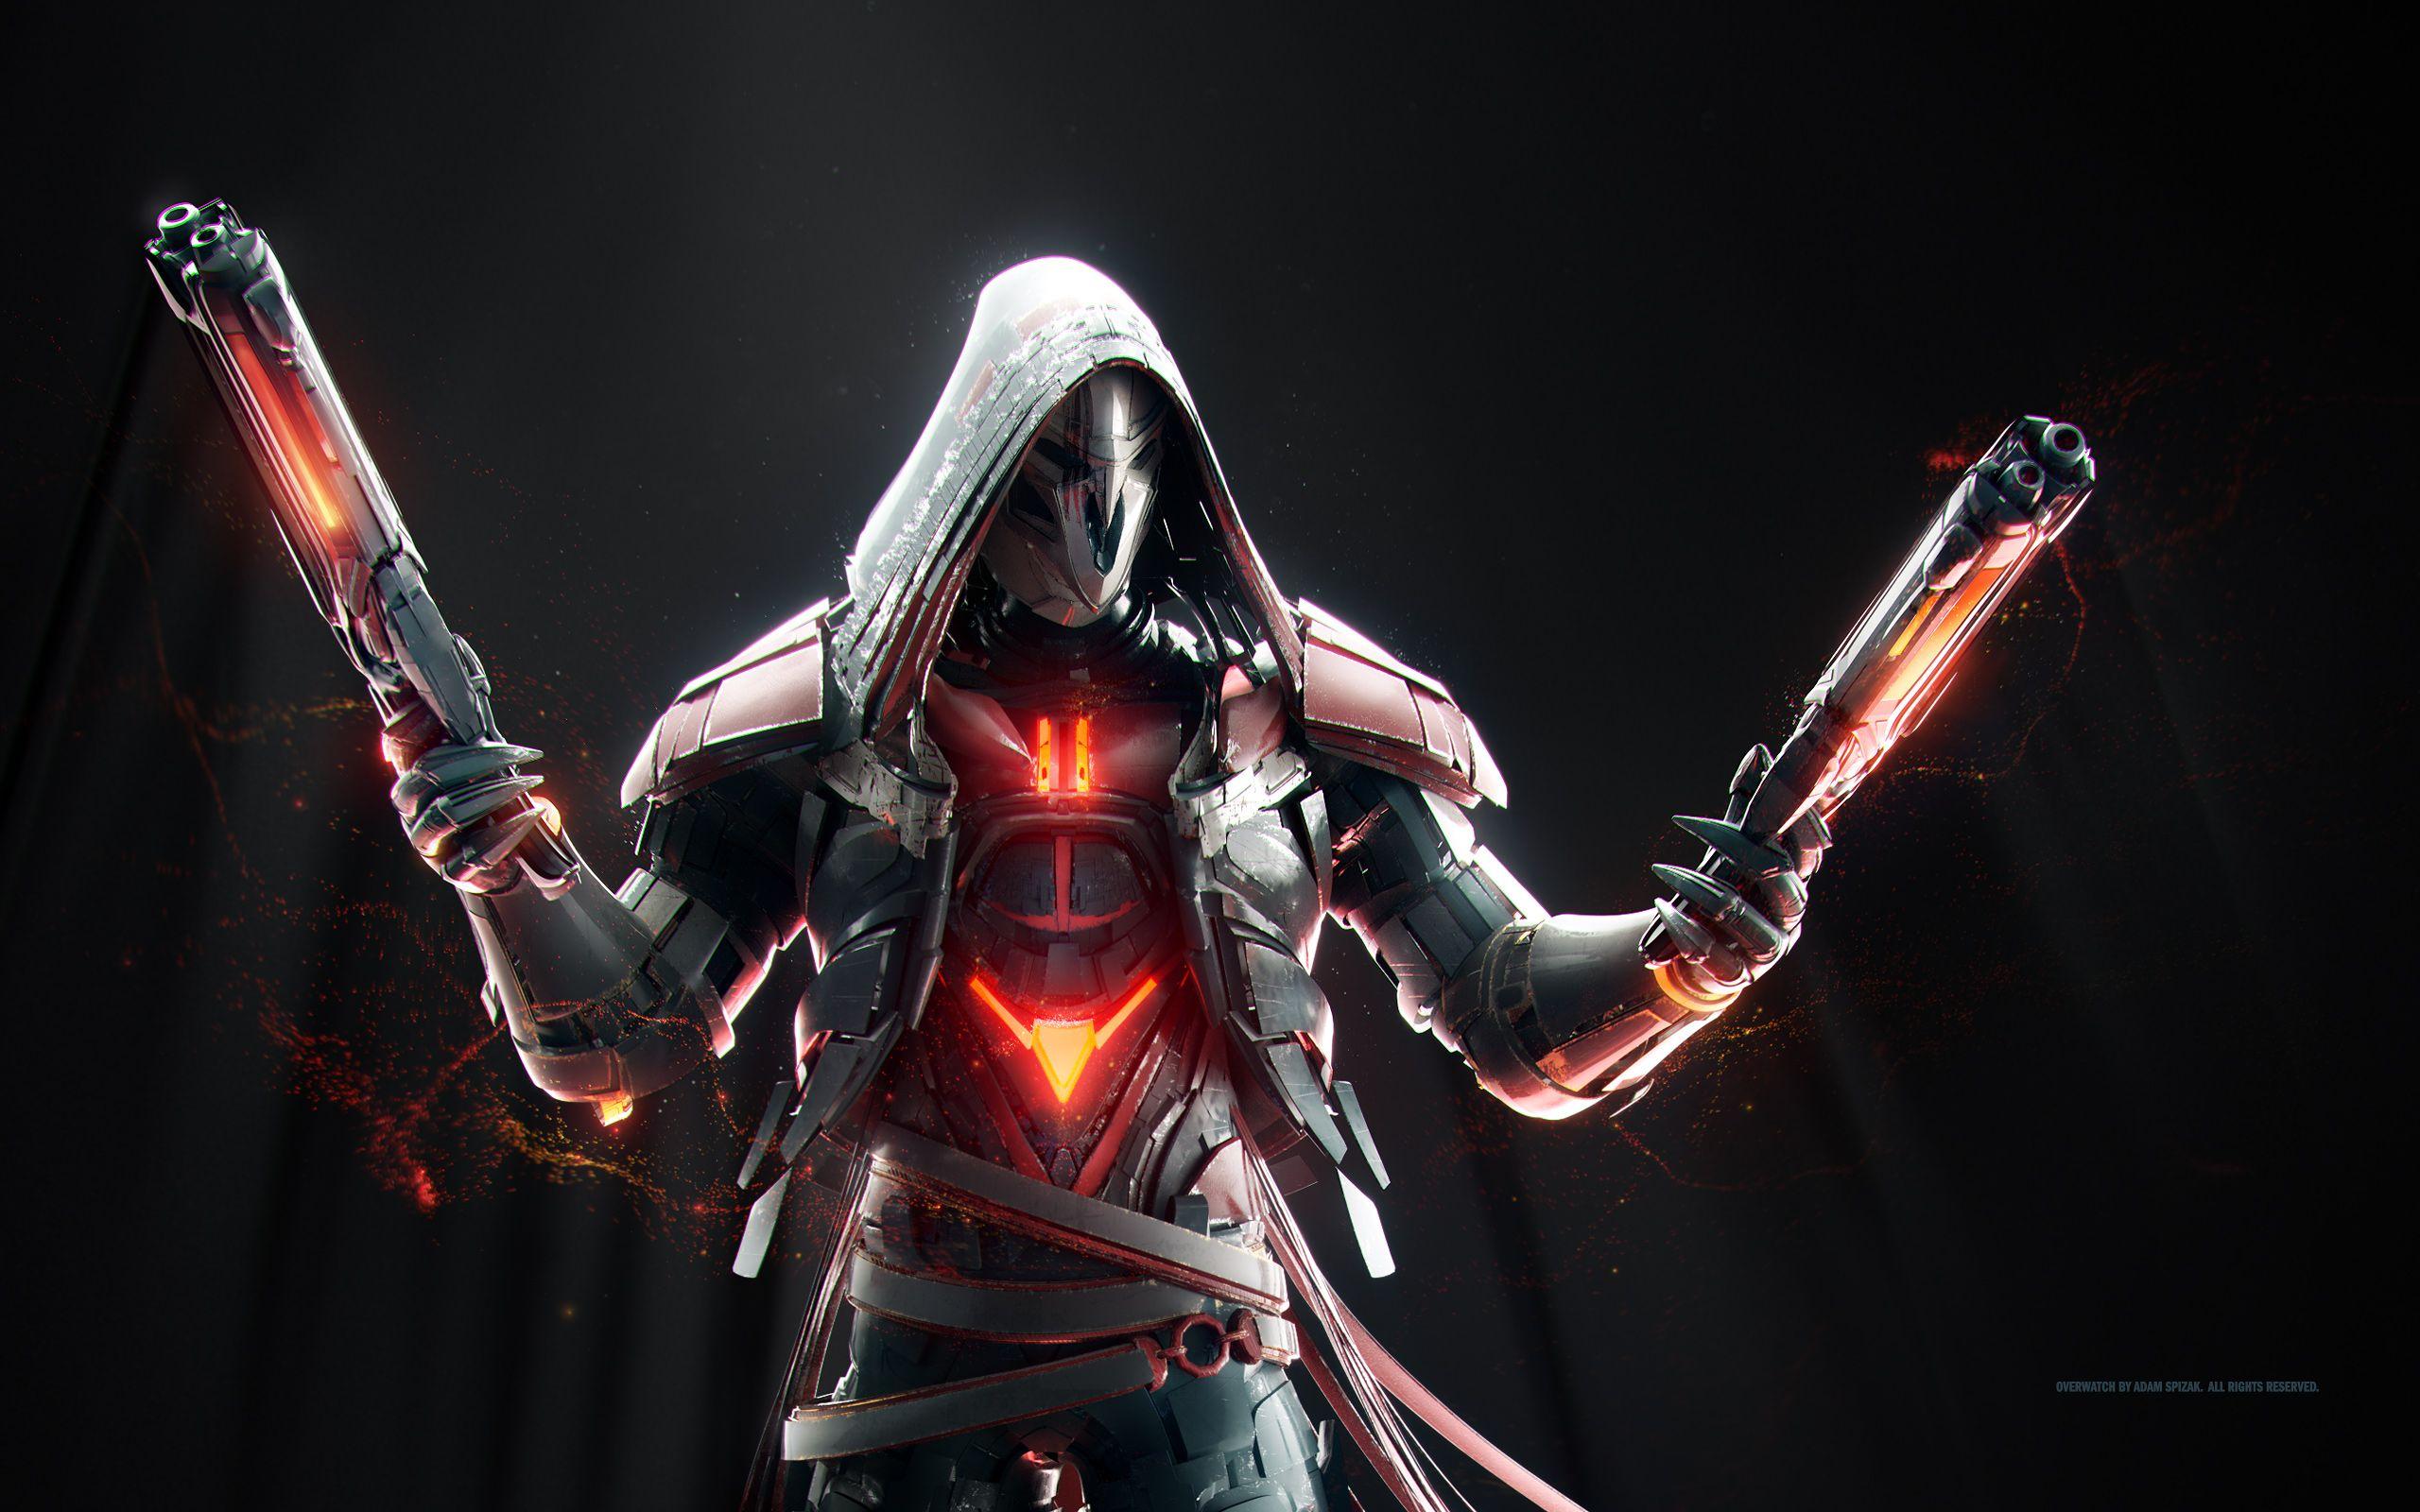 Resultado De Imagen Para Reaper Wallpaper Hd Overwatch